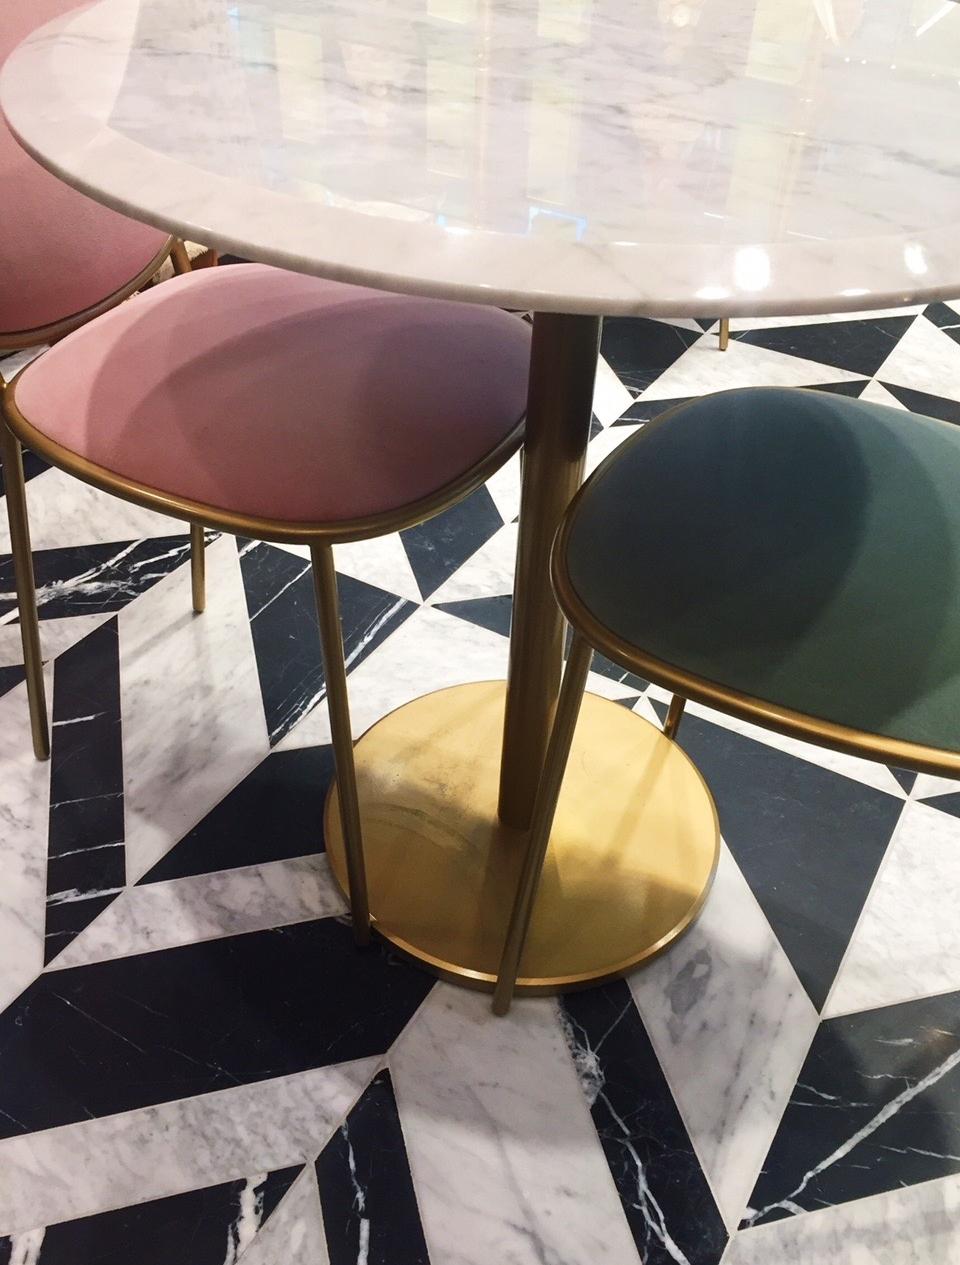 Ladurée Boutique Yordale Mall Interior Design